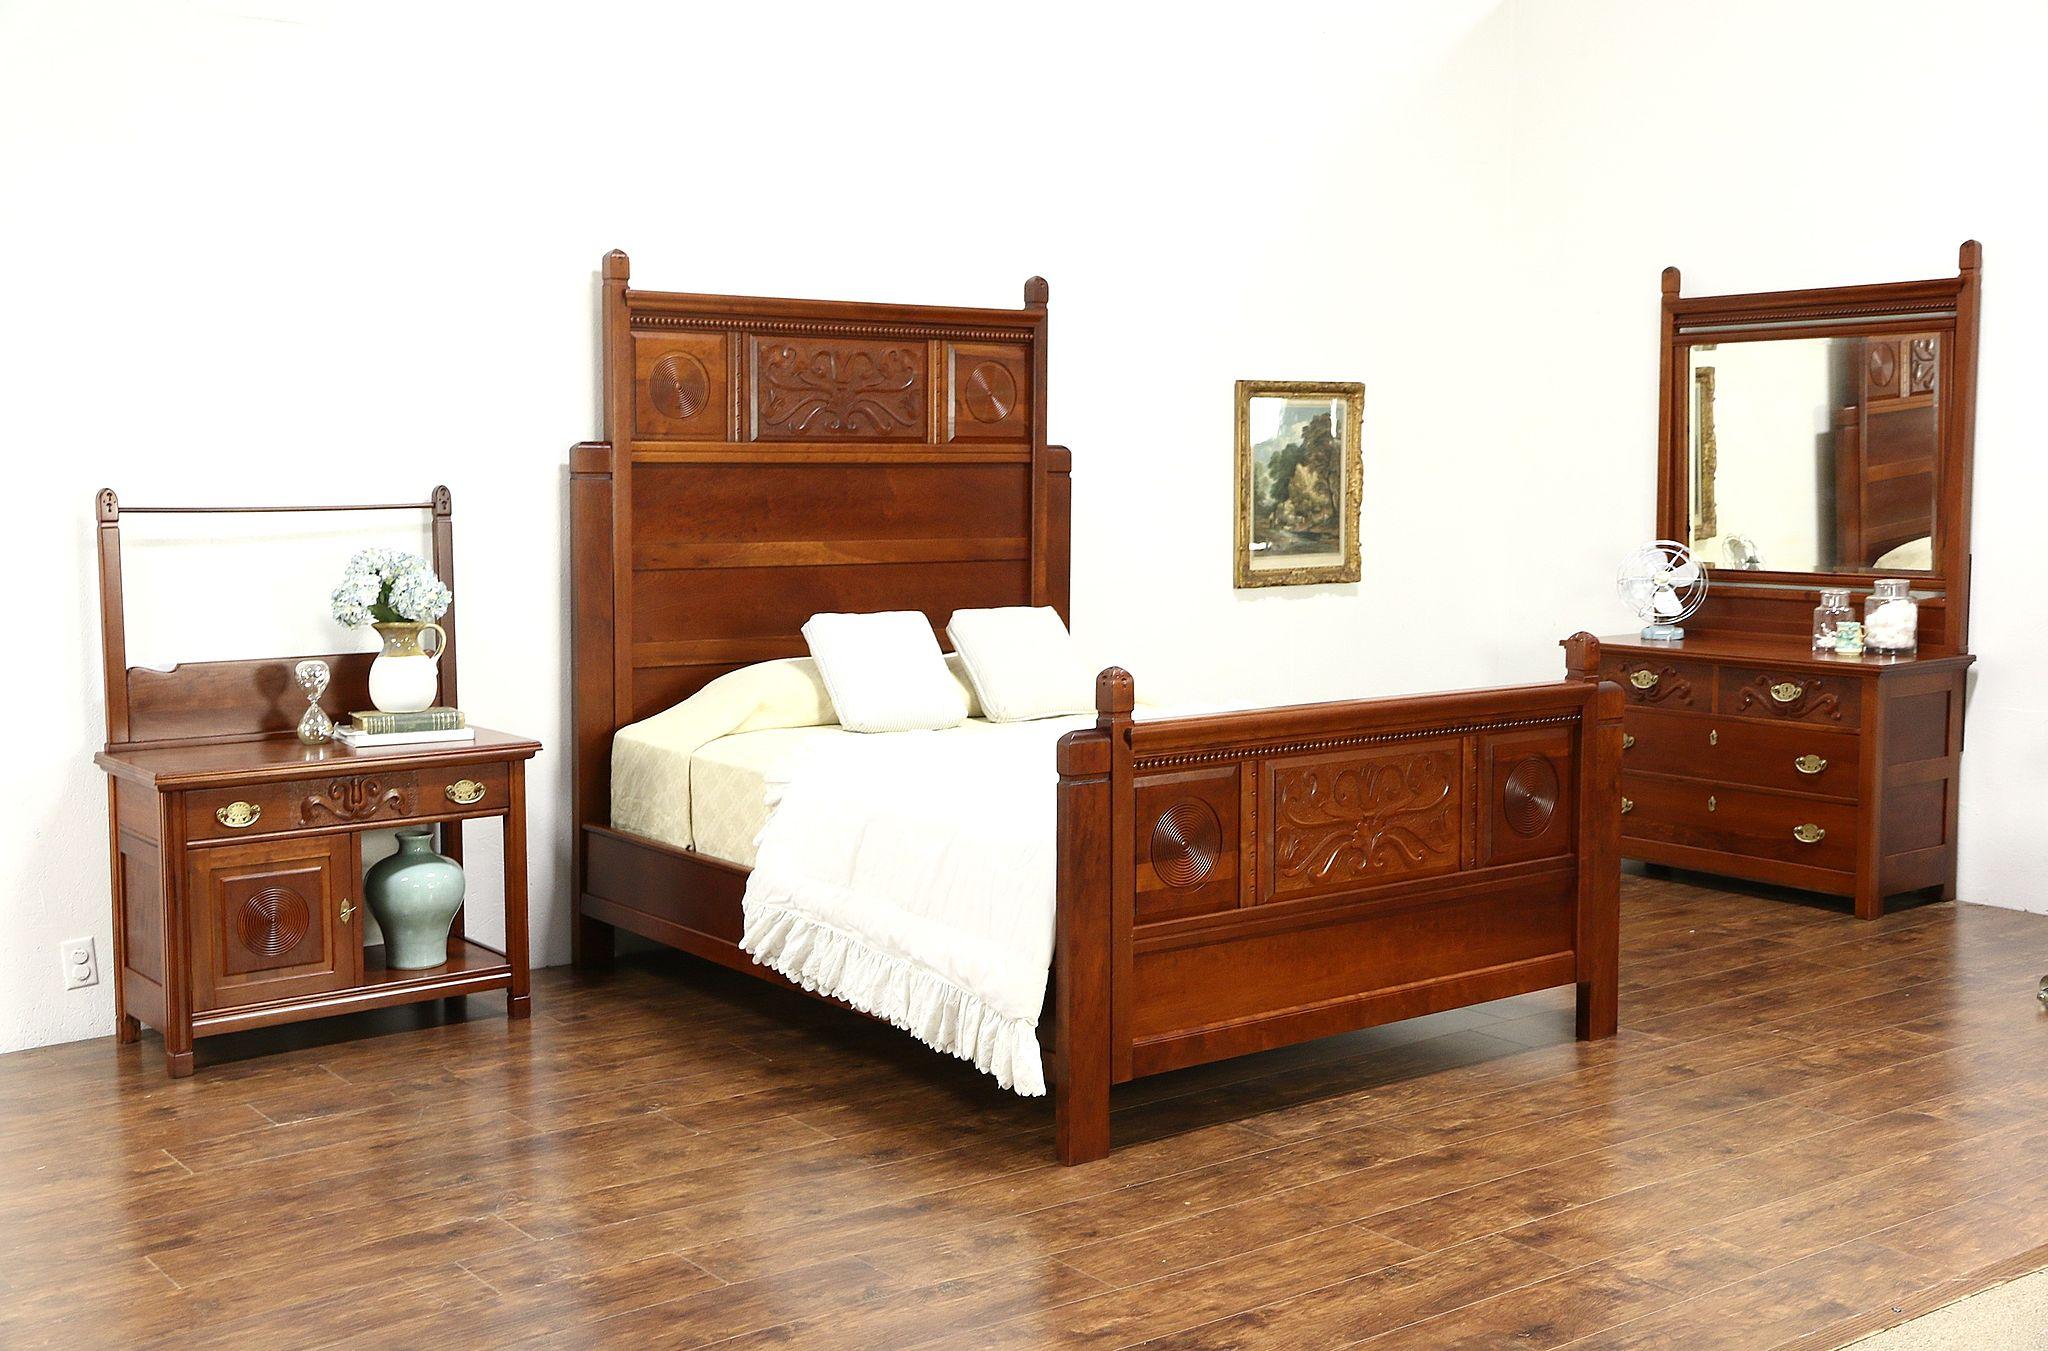 Victorian 1890 Antique Carved Cherry 3 Pc Bedroom Set Queen Size Bed Harp